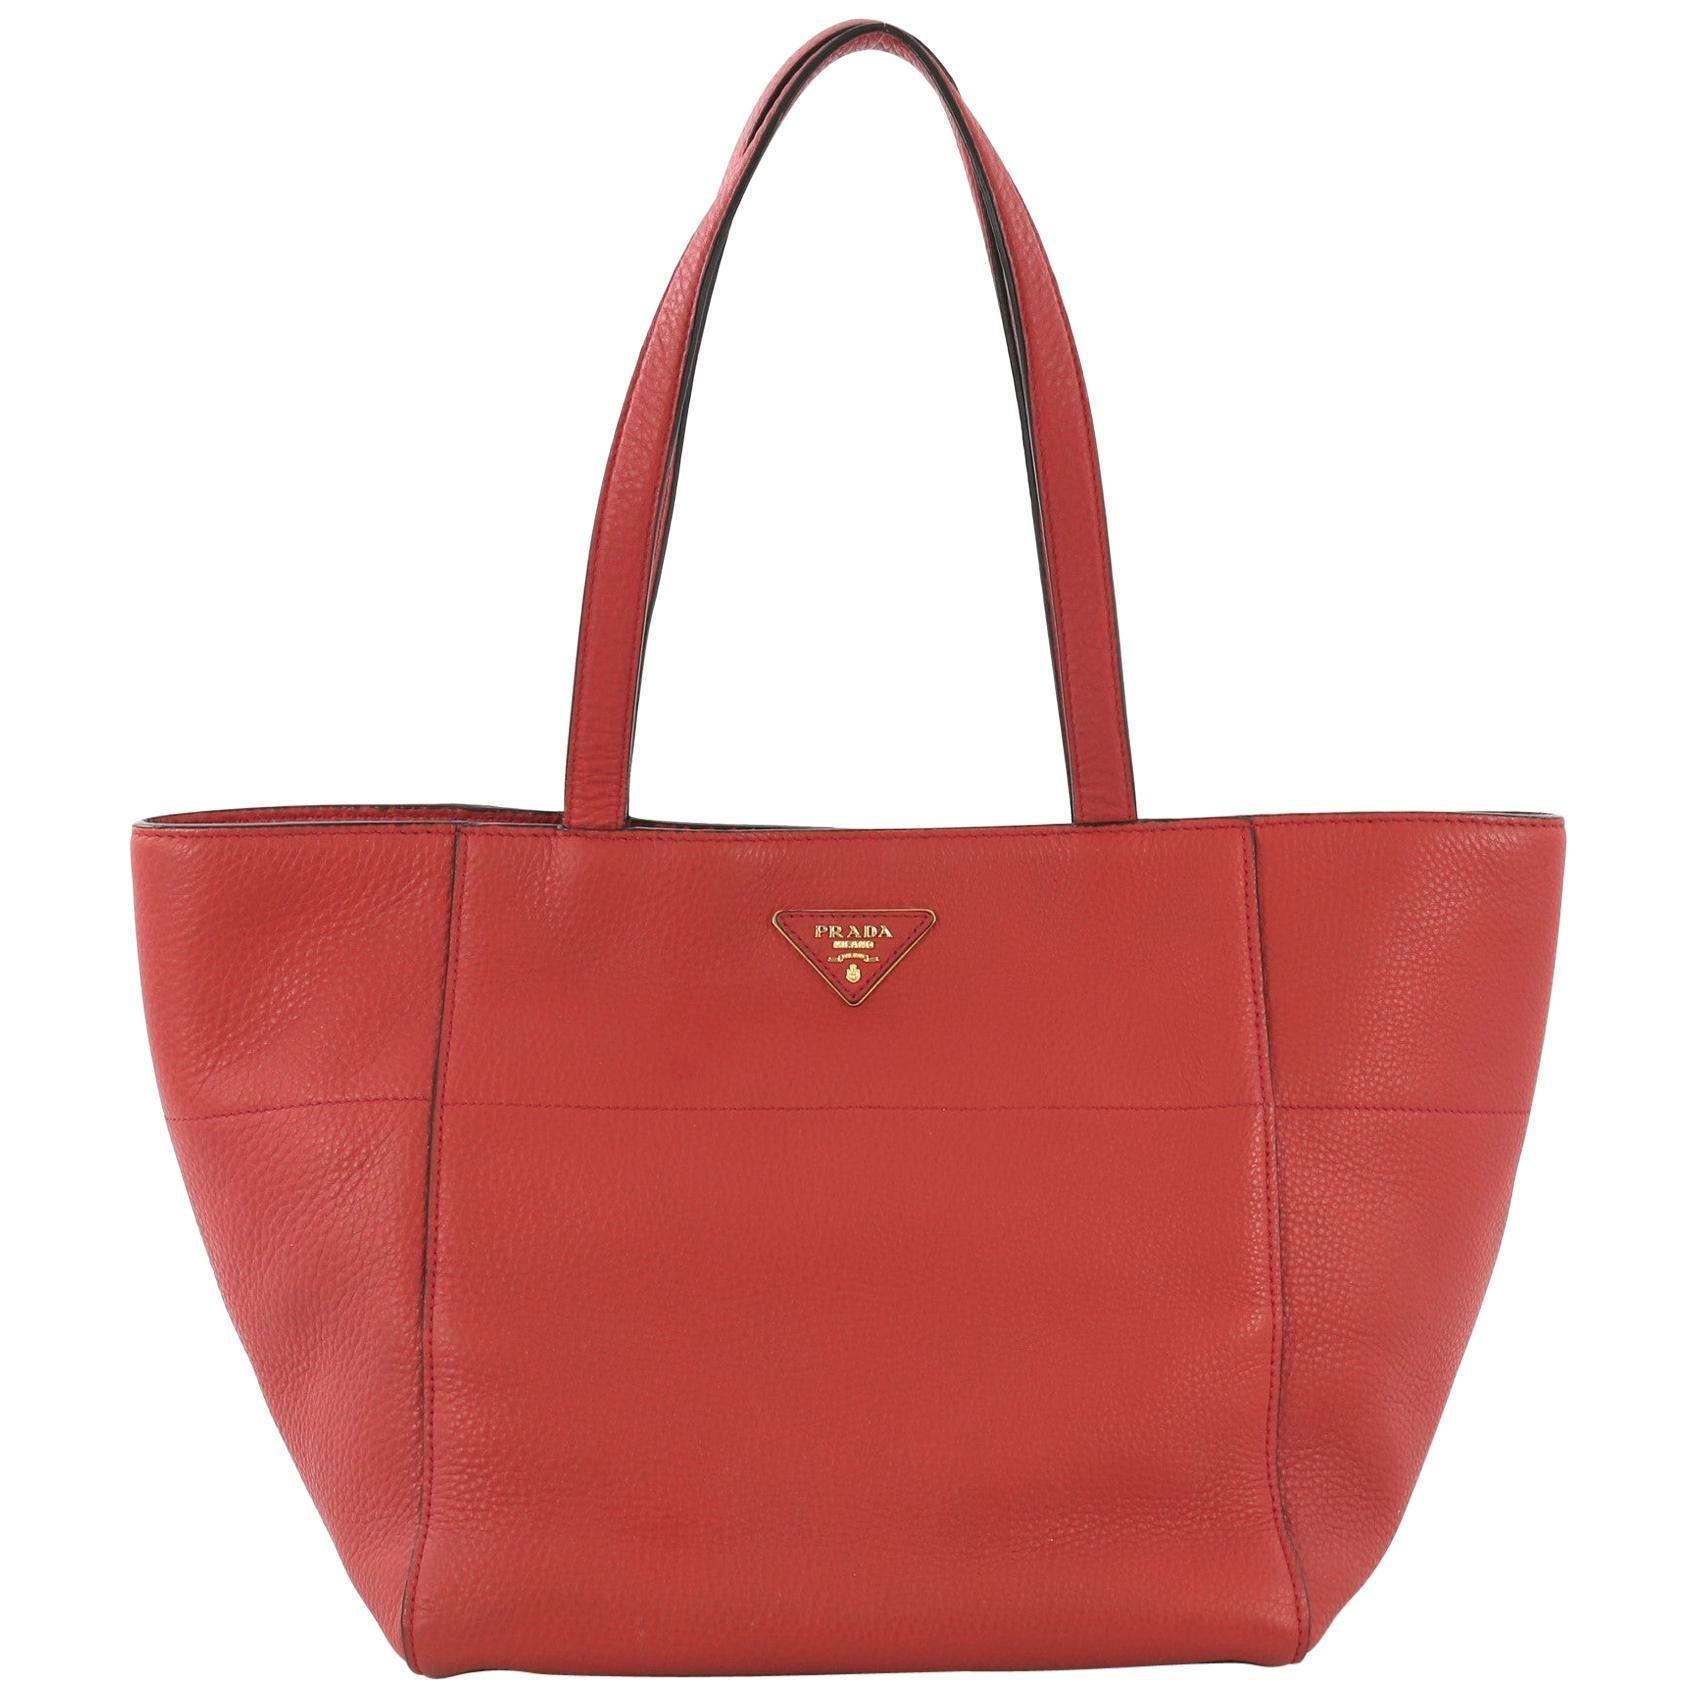 59fb23255c Vintage Prada Tote Bags - 364 For Sale at 1stdibs